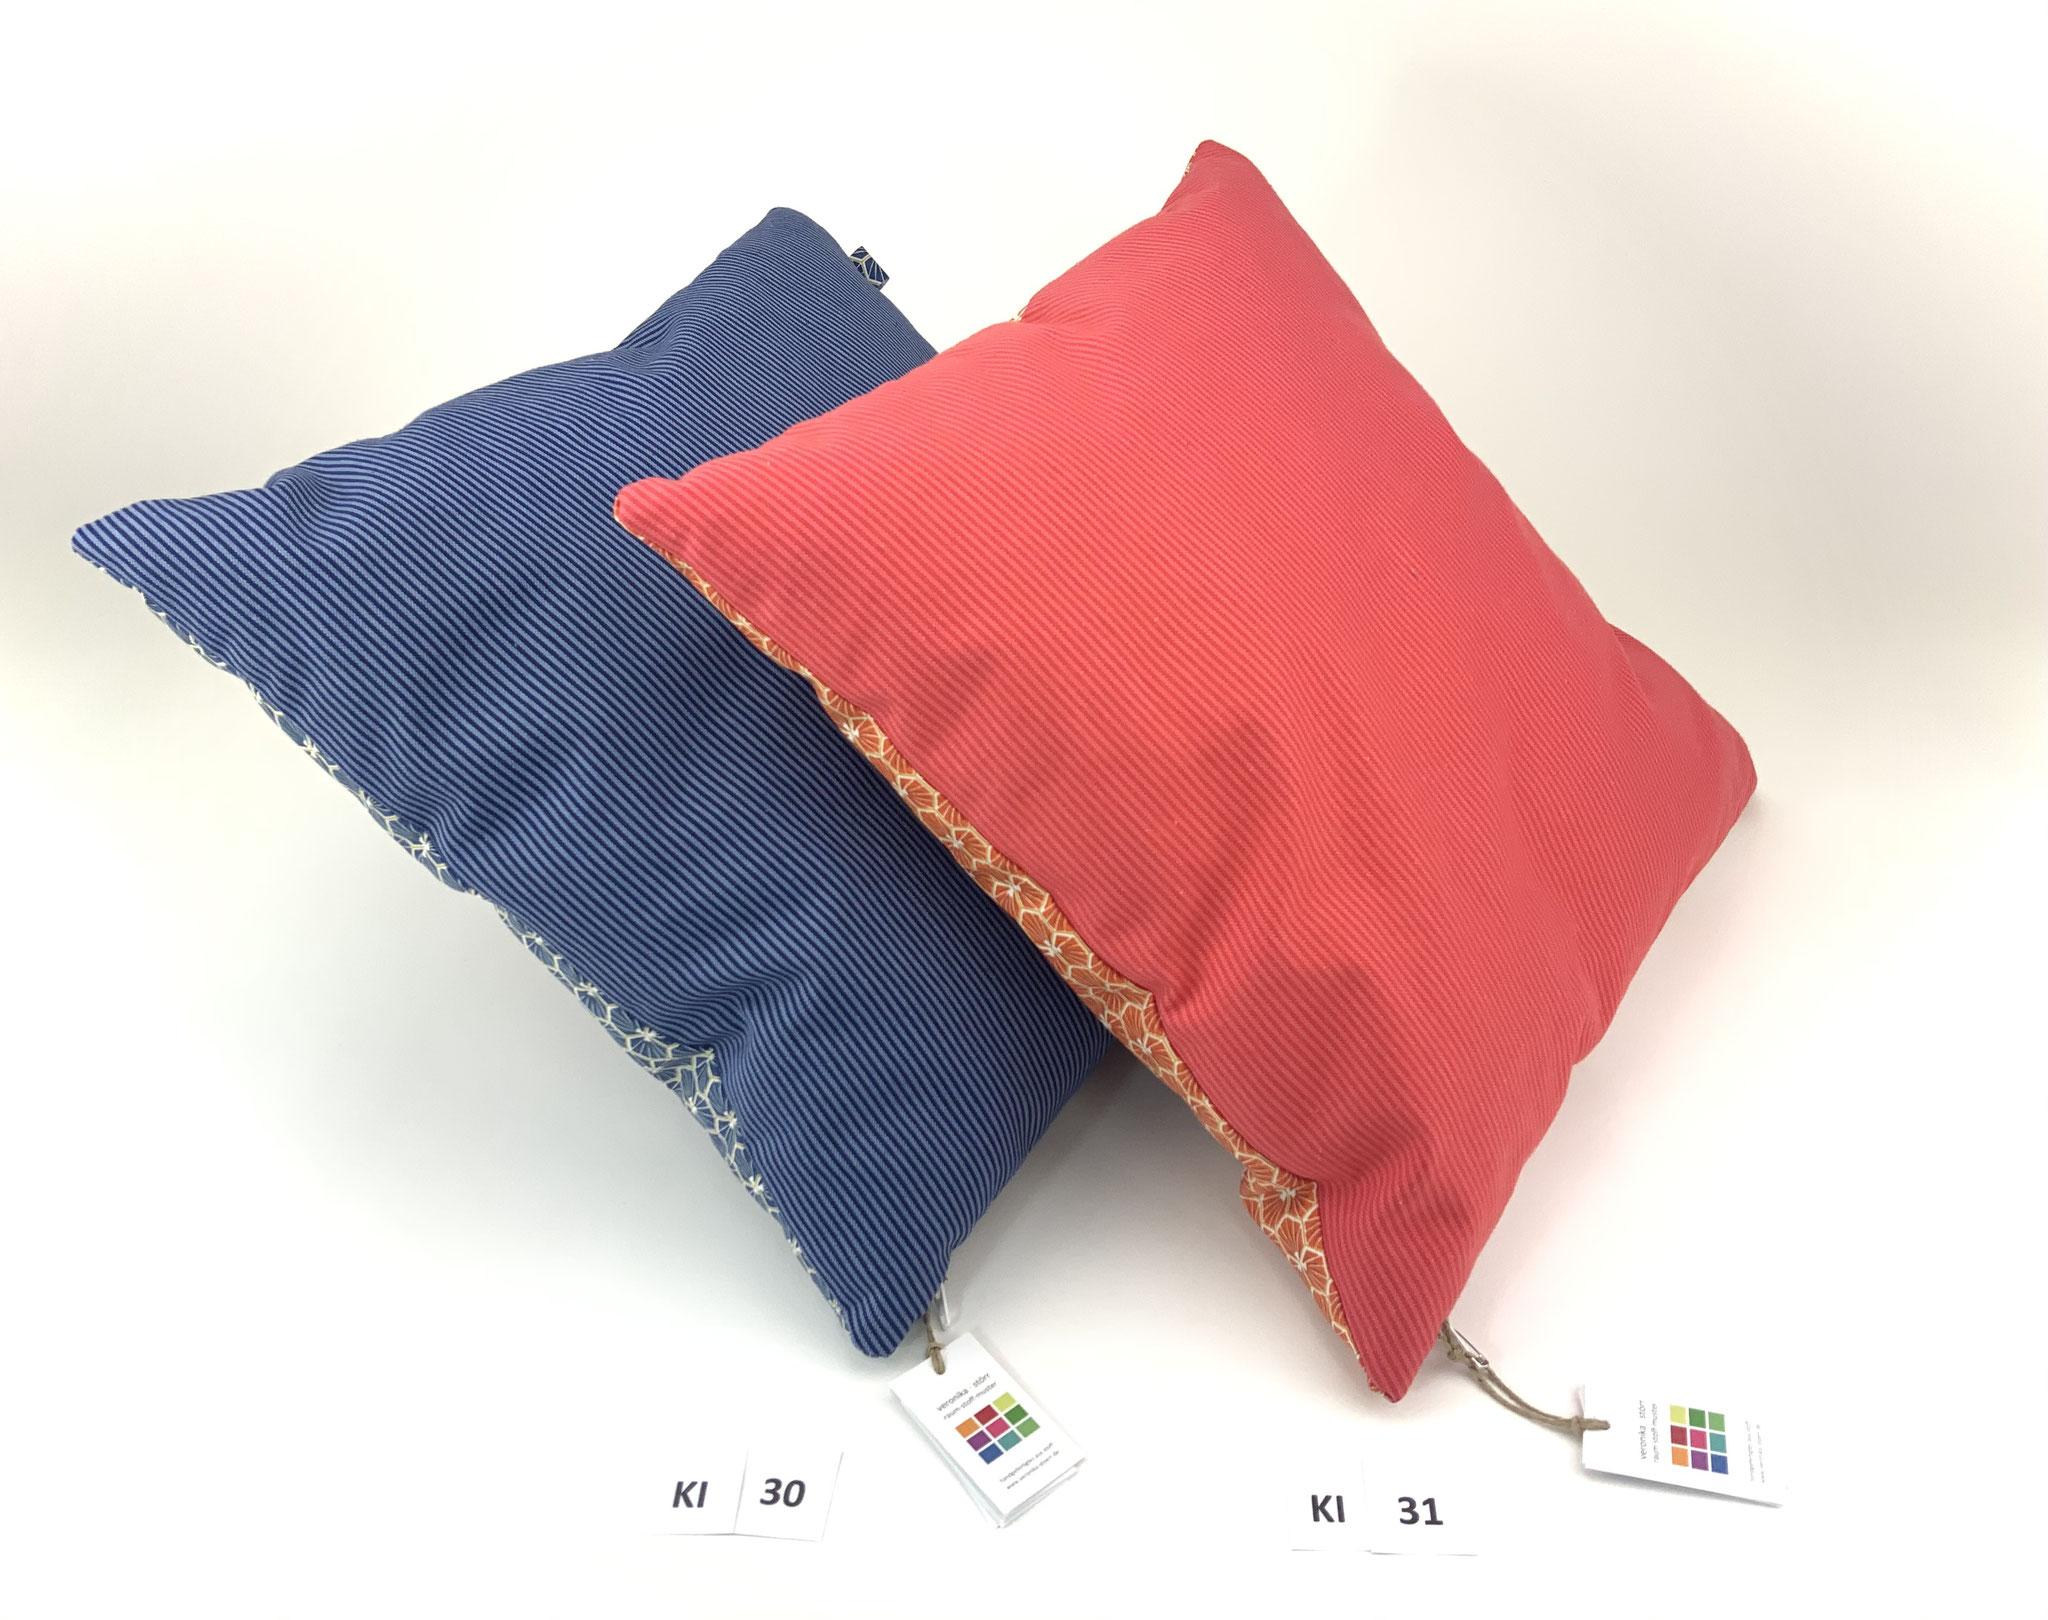 Ki 30: verkauft——— Ki 31: 36 x 36 cm * Bezug BW Öko + BBW / separates Inlett Kunstfaser / komplett 16,90 €